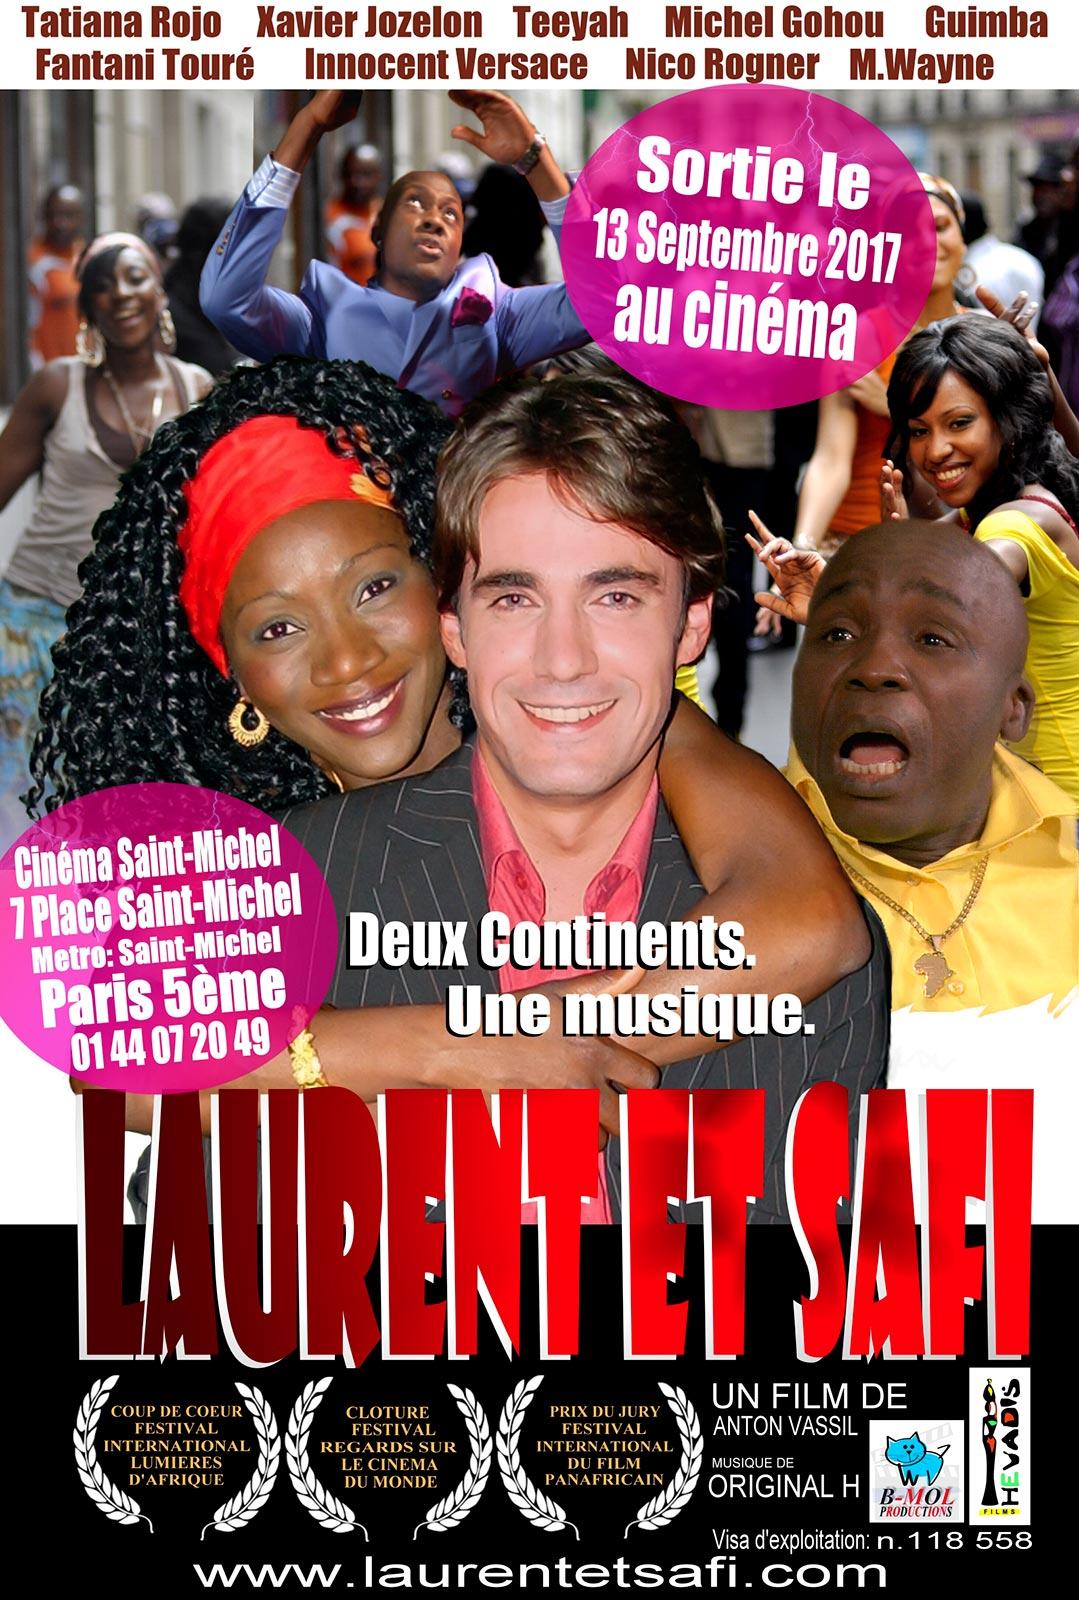 Laurent et Safi